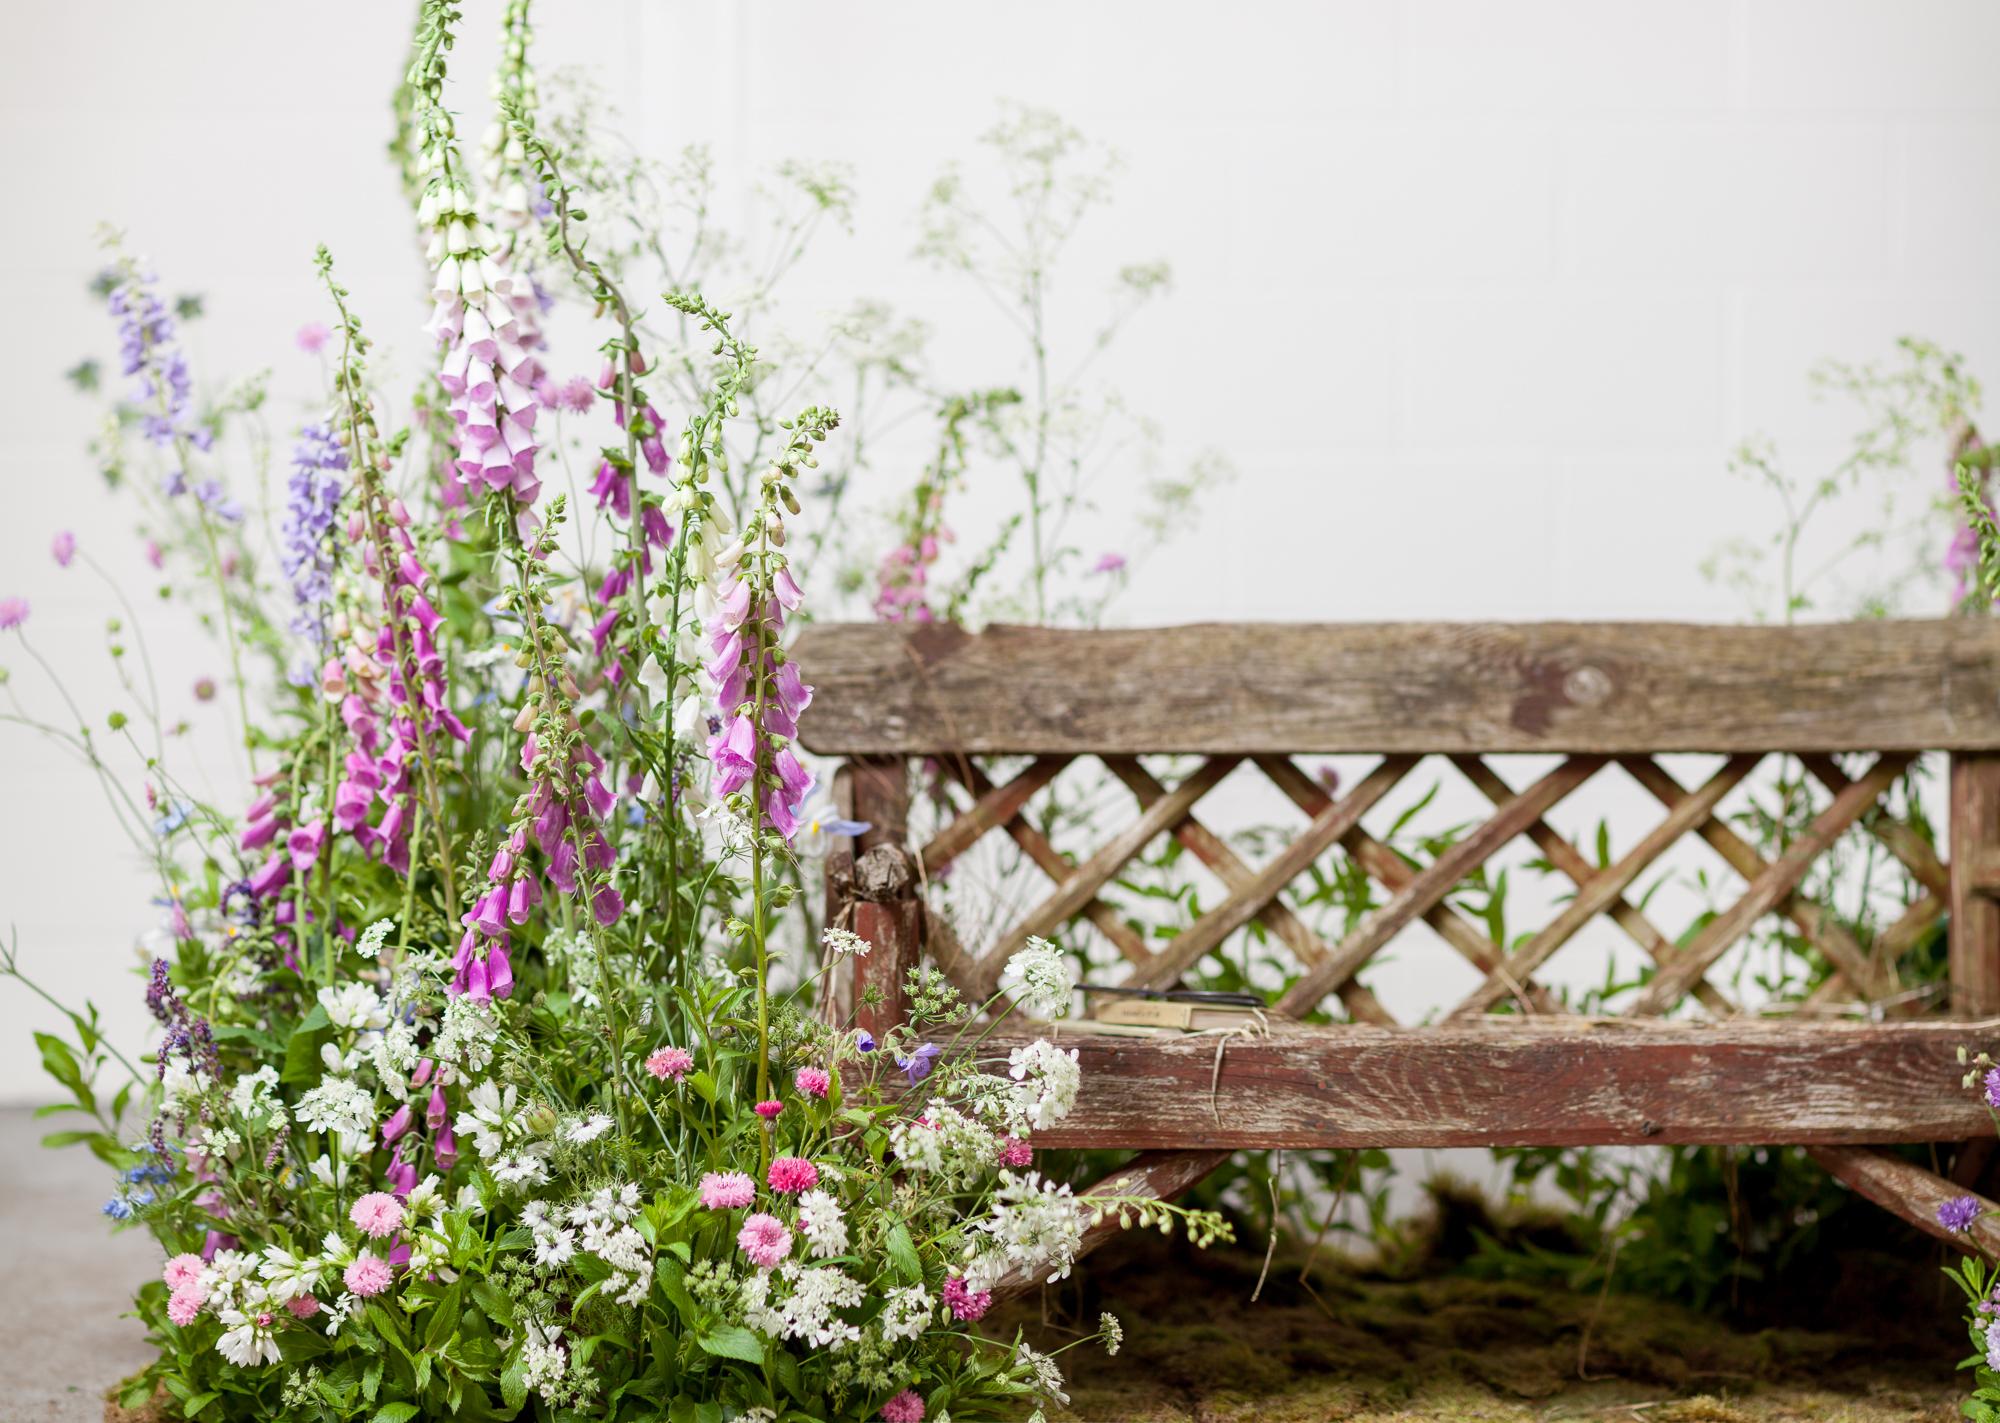 British Flowers Week 2017 - Jennifer Pinder chosen as one of the 5 representatives